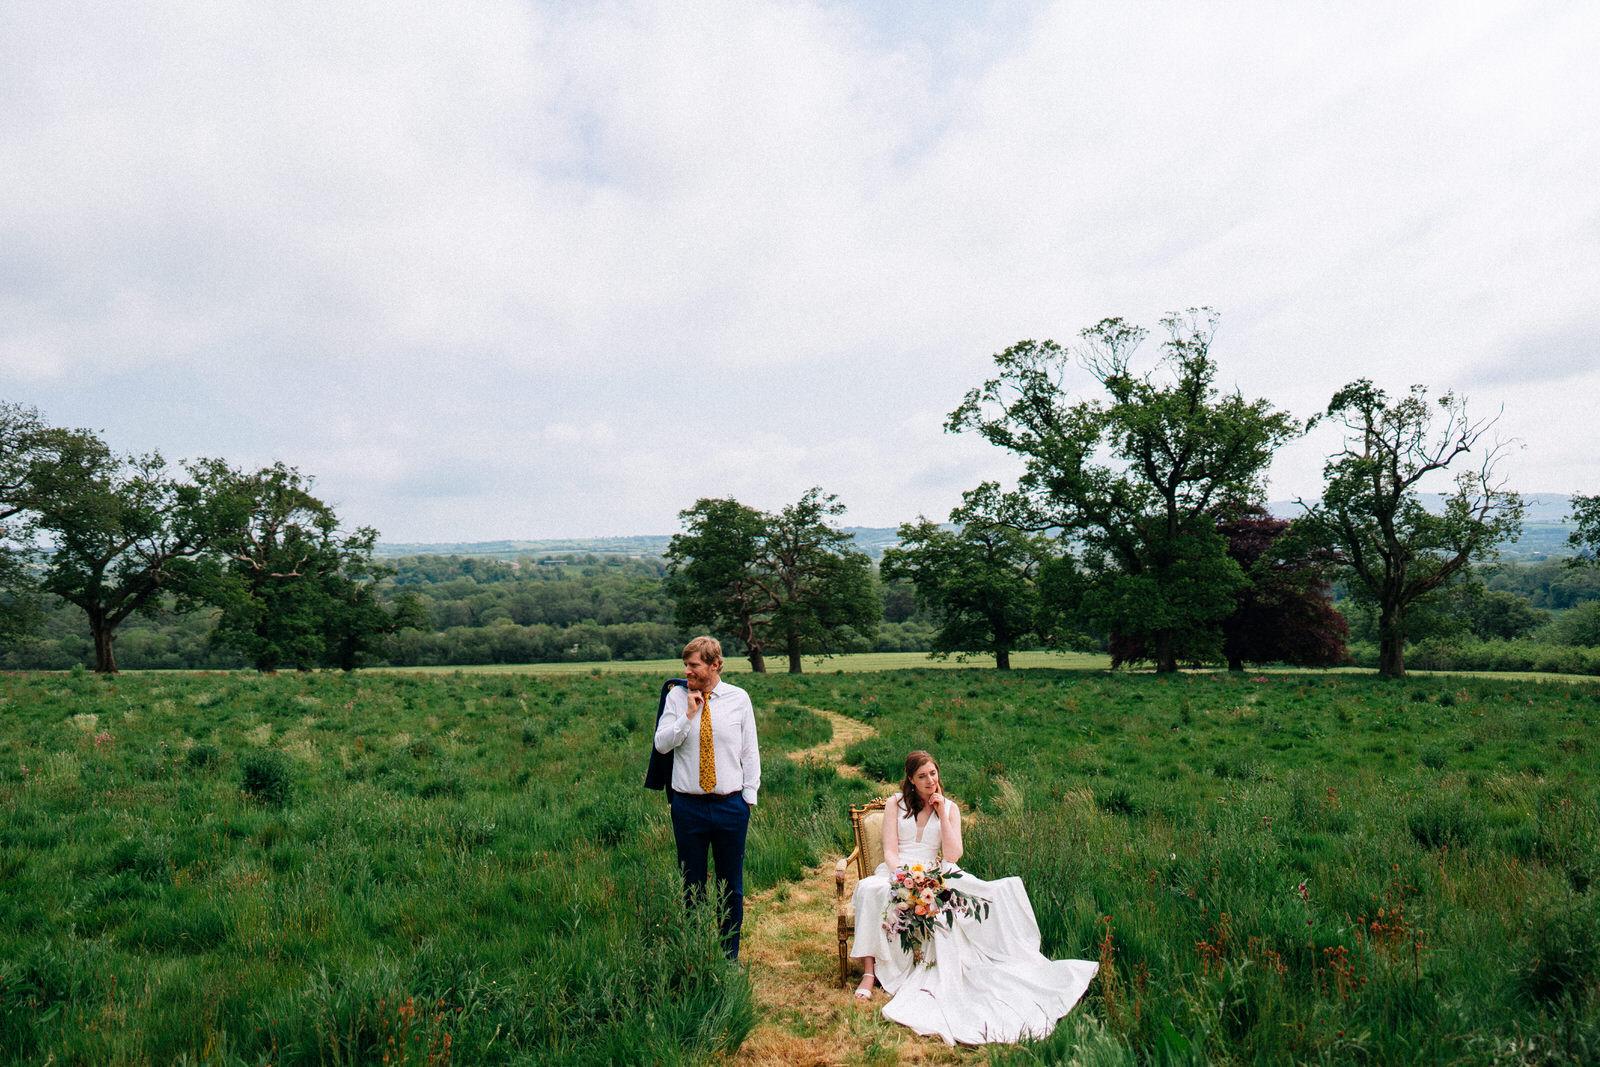 Cork documentary wedding photography 0121 120